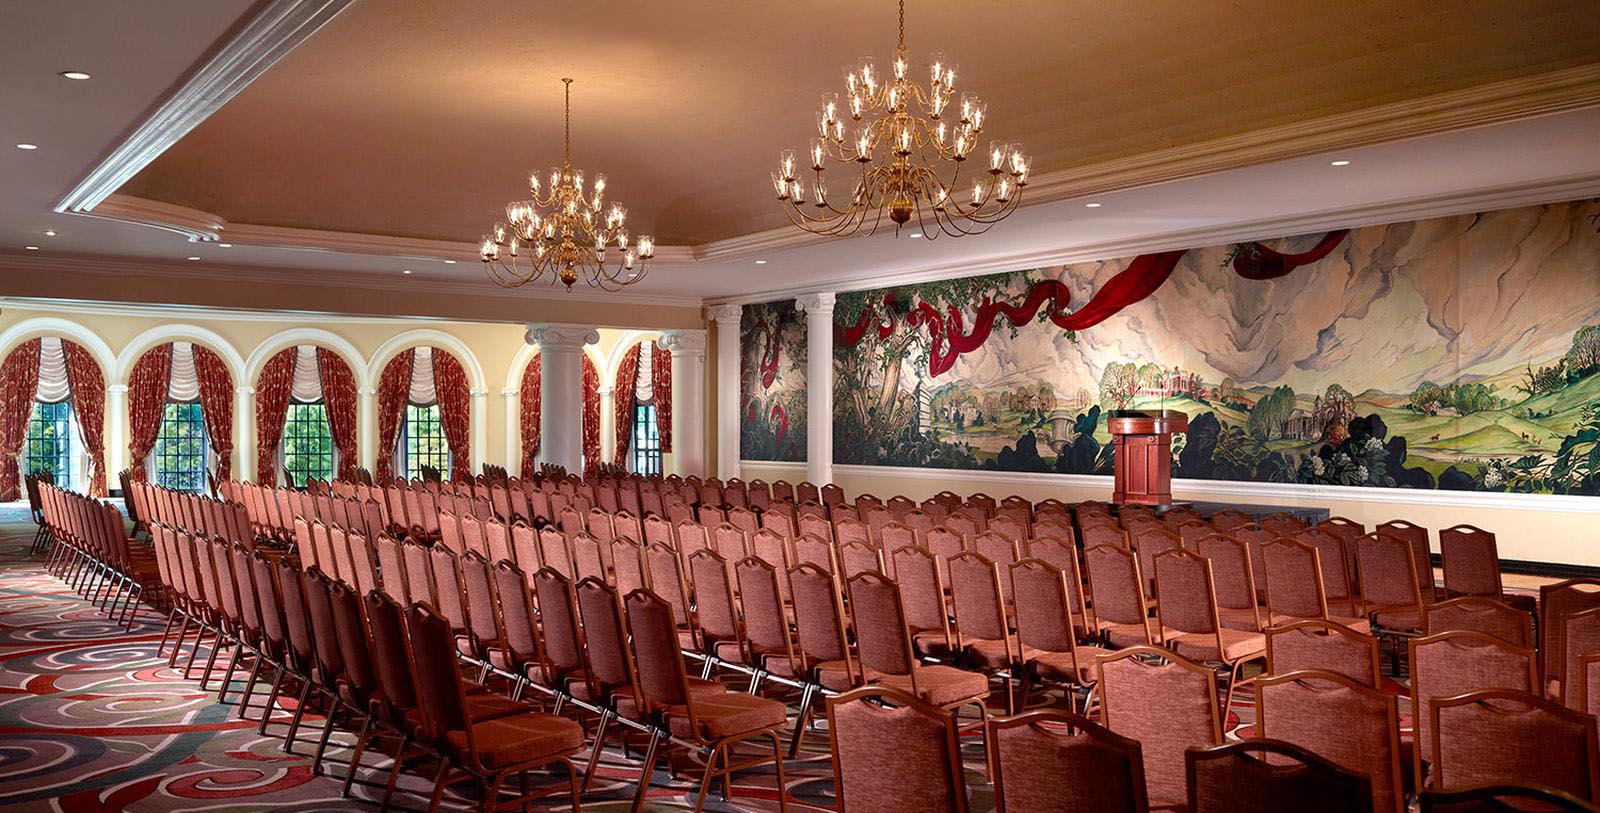 Image of Ballroom Theater, Omni William Penn Hotel, Pittsburgh, Pennsylvania, 1916, Member of Historic Hotels of America, Experience